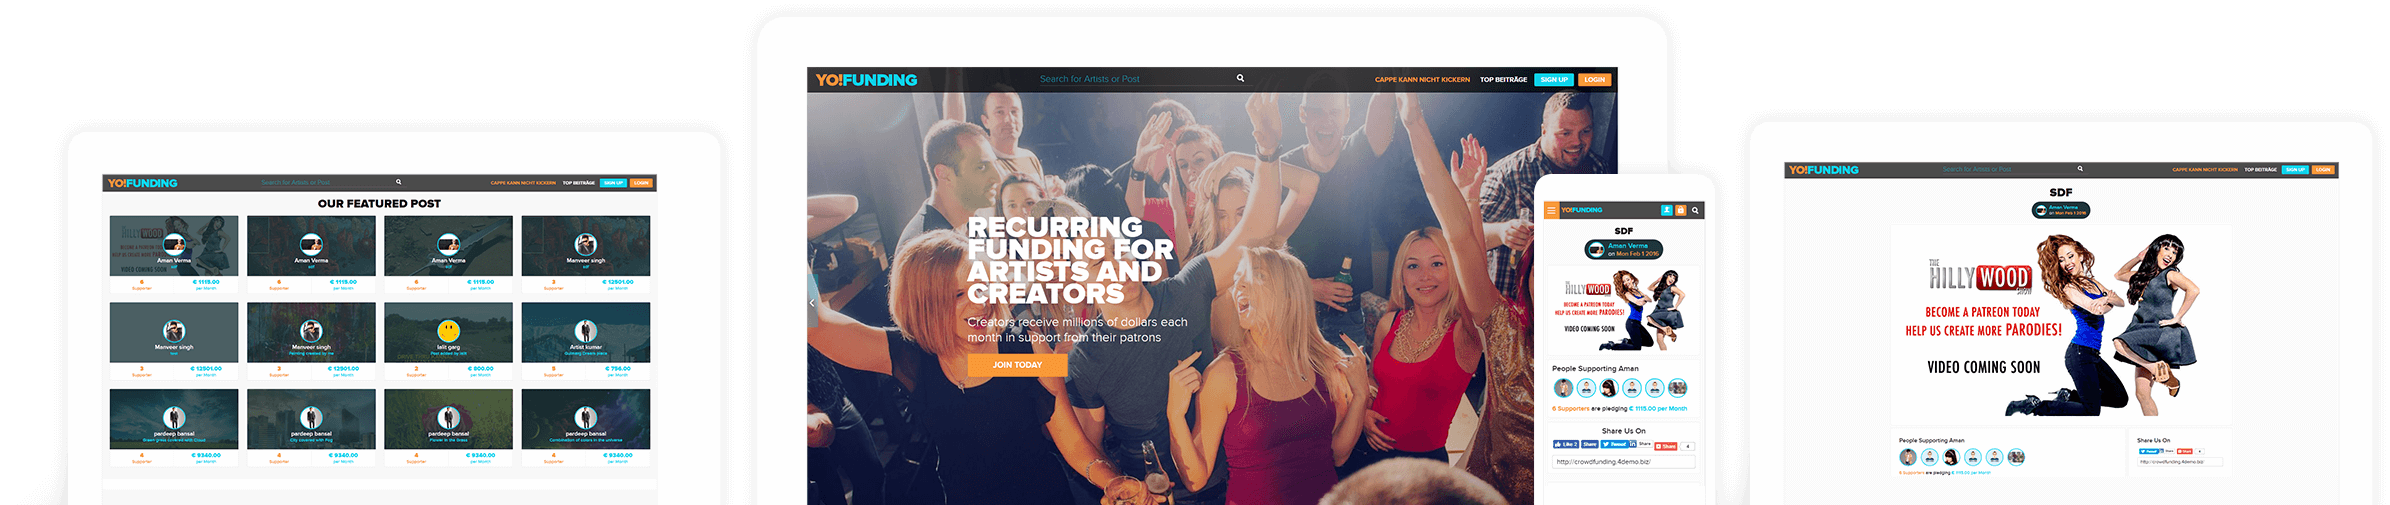 online crowdfunding portal